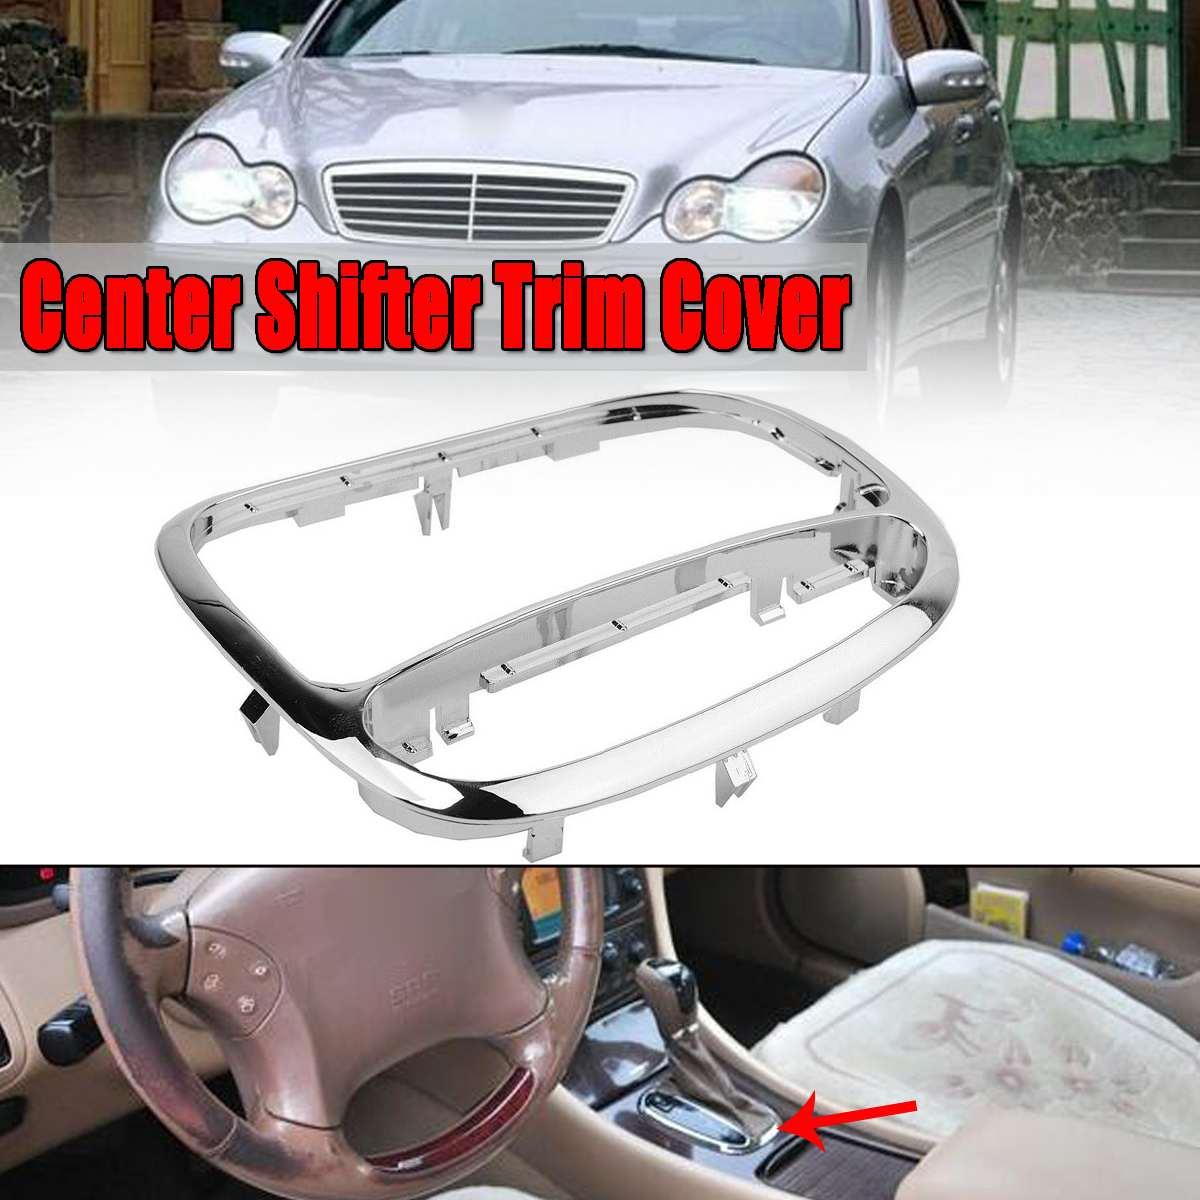 1x car center gear shifter panel decorative trim cover bezel fit for mercedes for benz c [ 1200 x 1200 Pixel ]